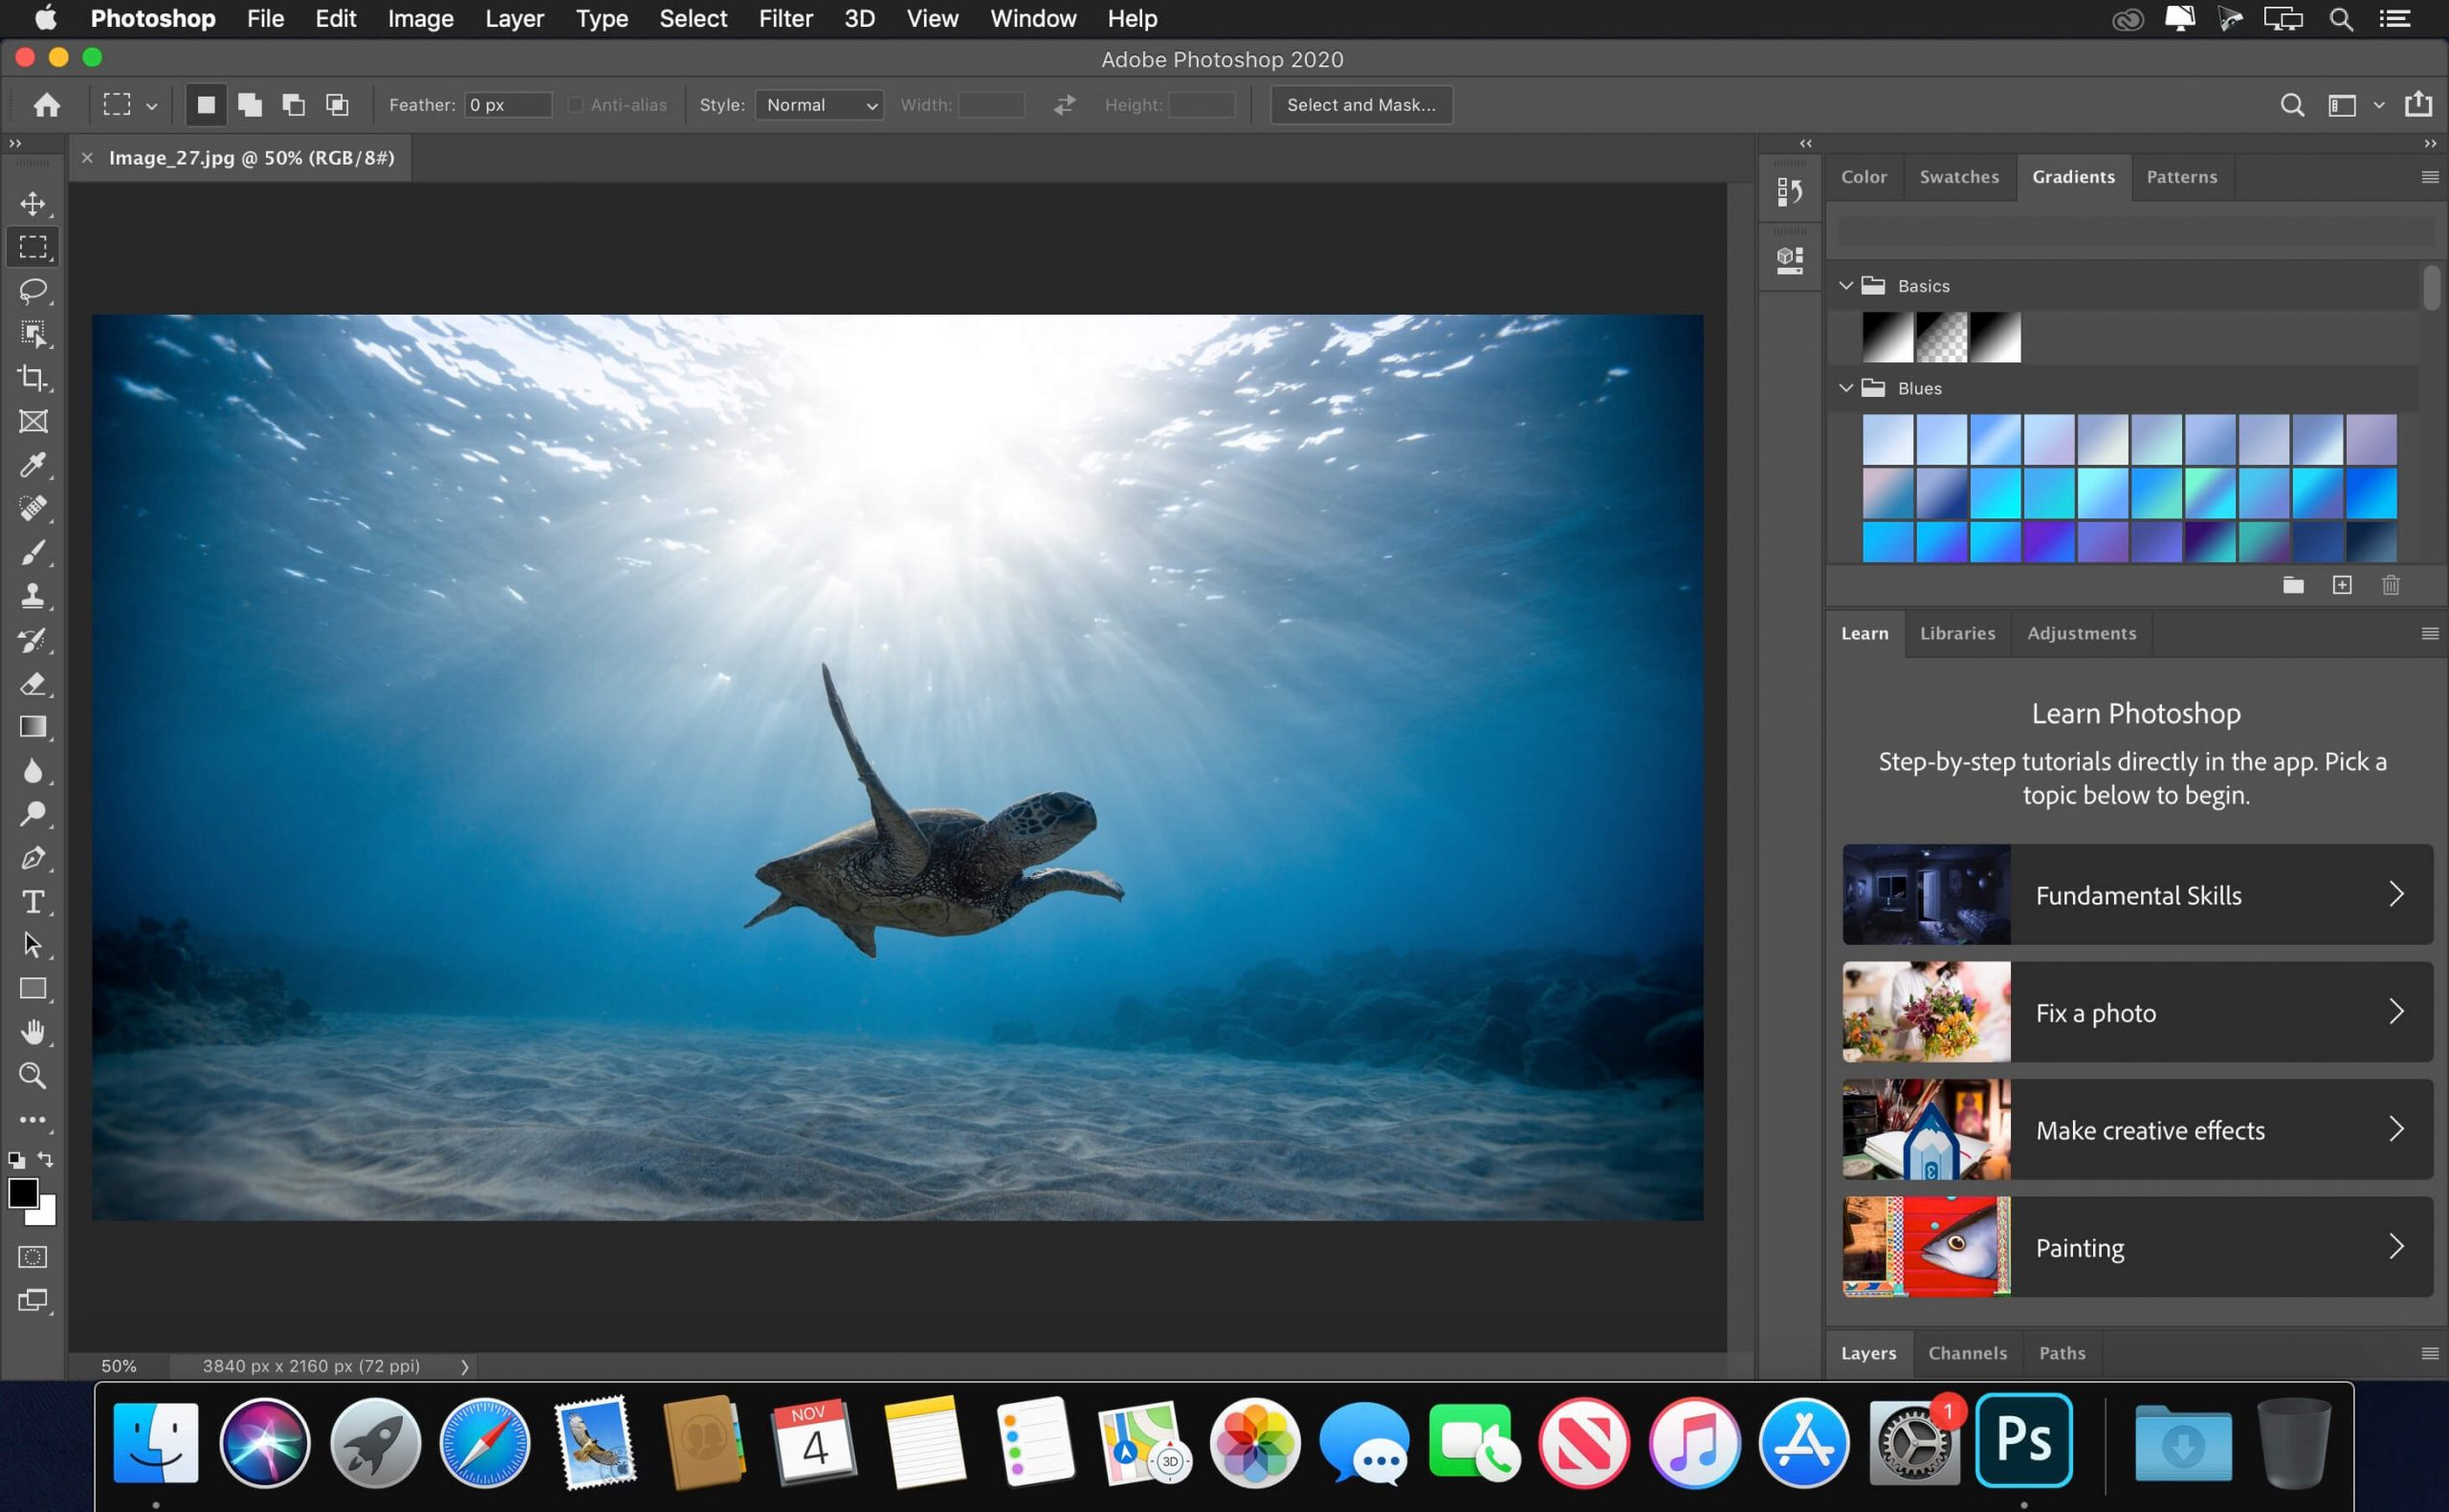 Adobe Photoshop CC Crack 2020 Full Key Torrent Latest Vers